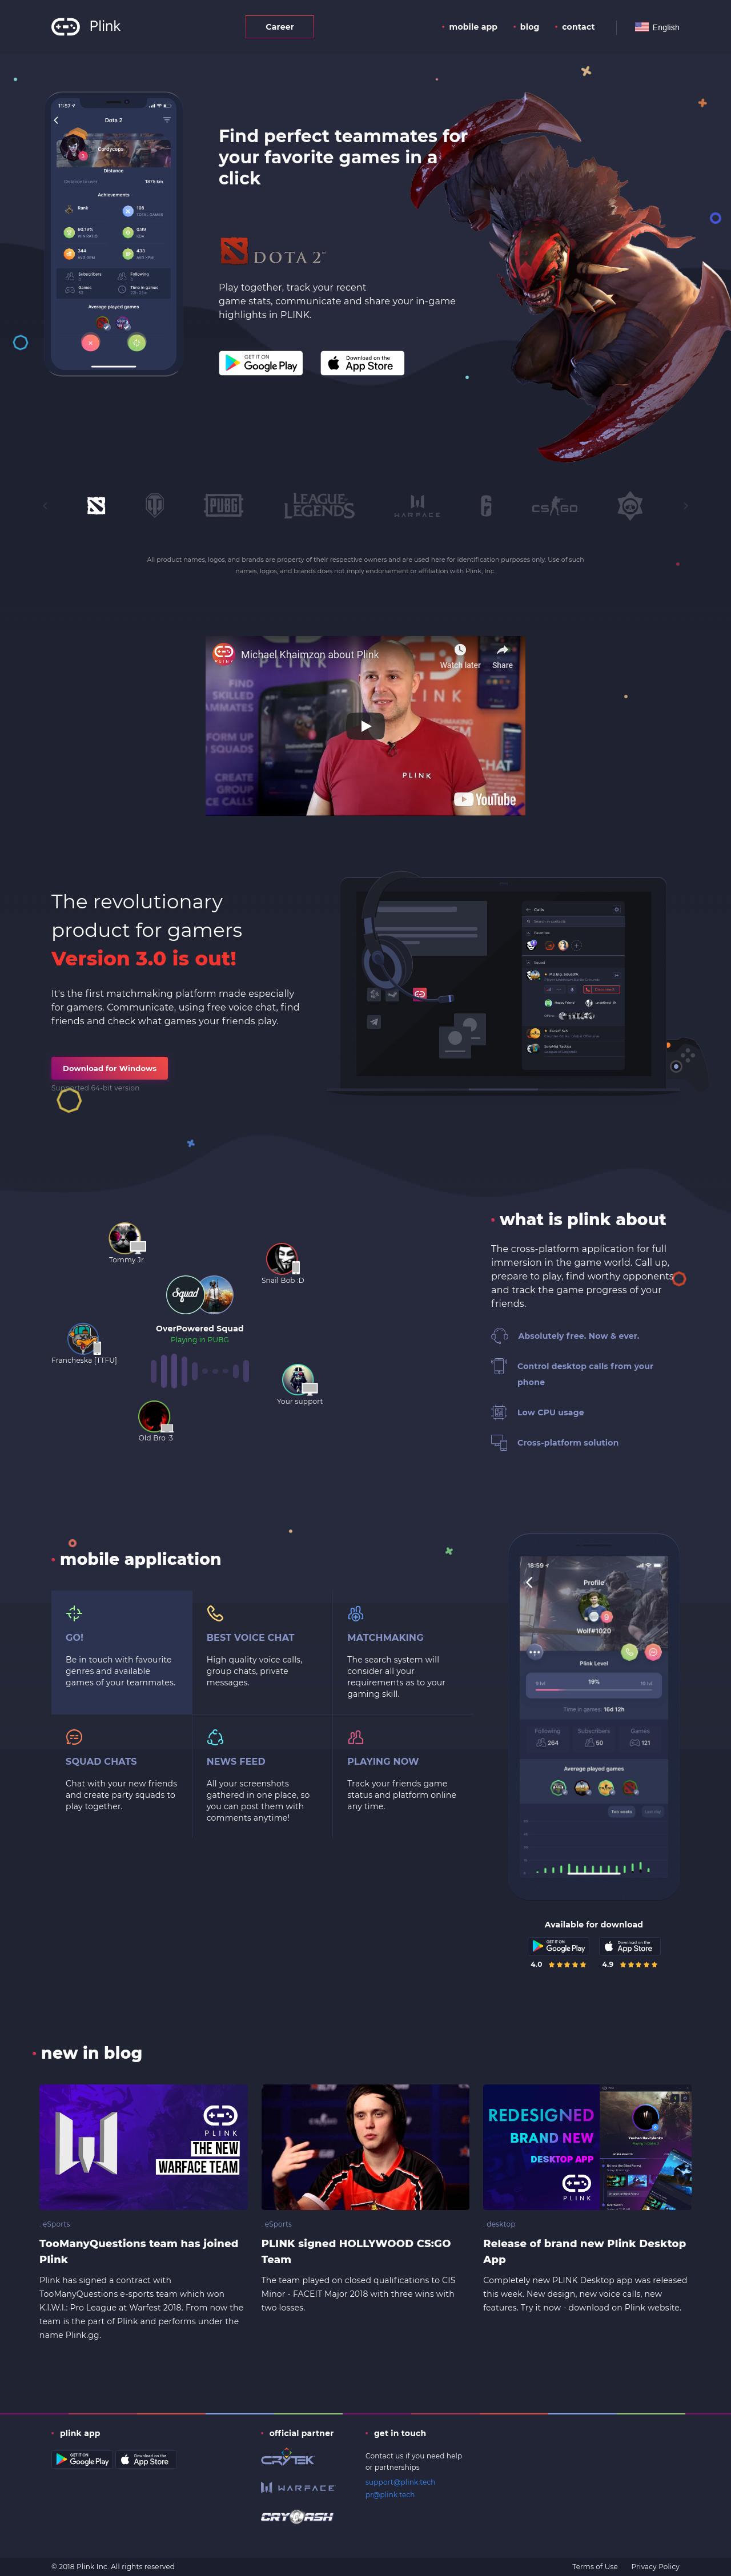 Best Landing Page Inspiration : plink gg